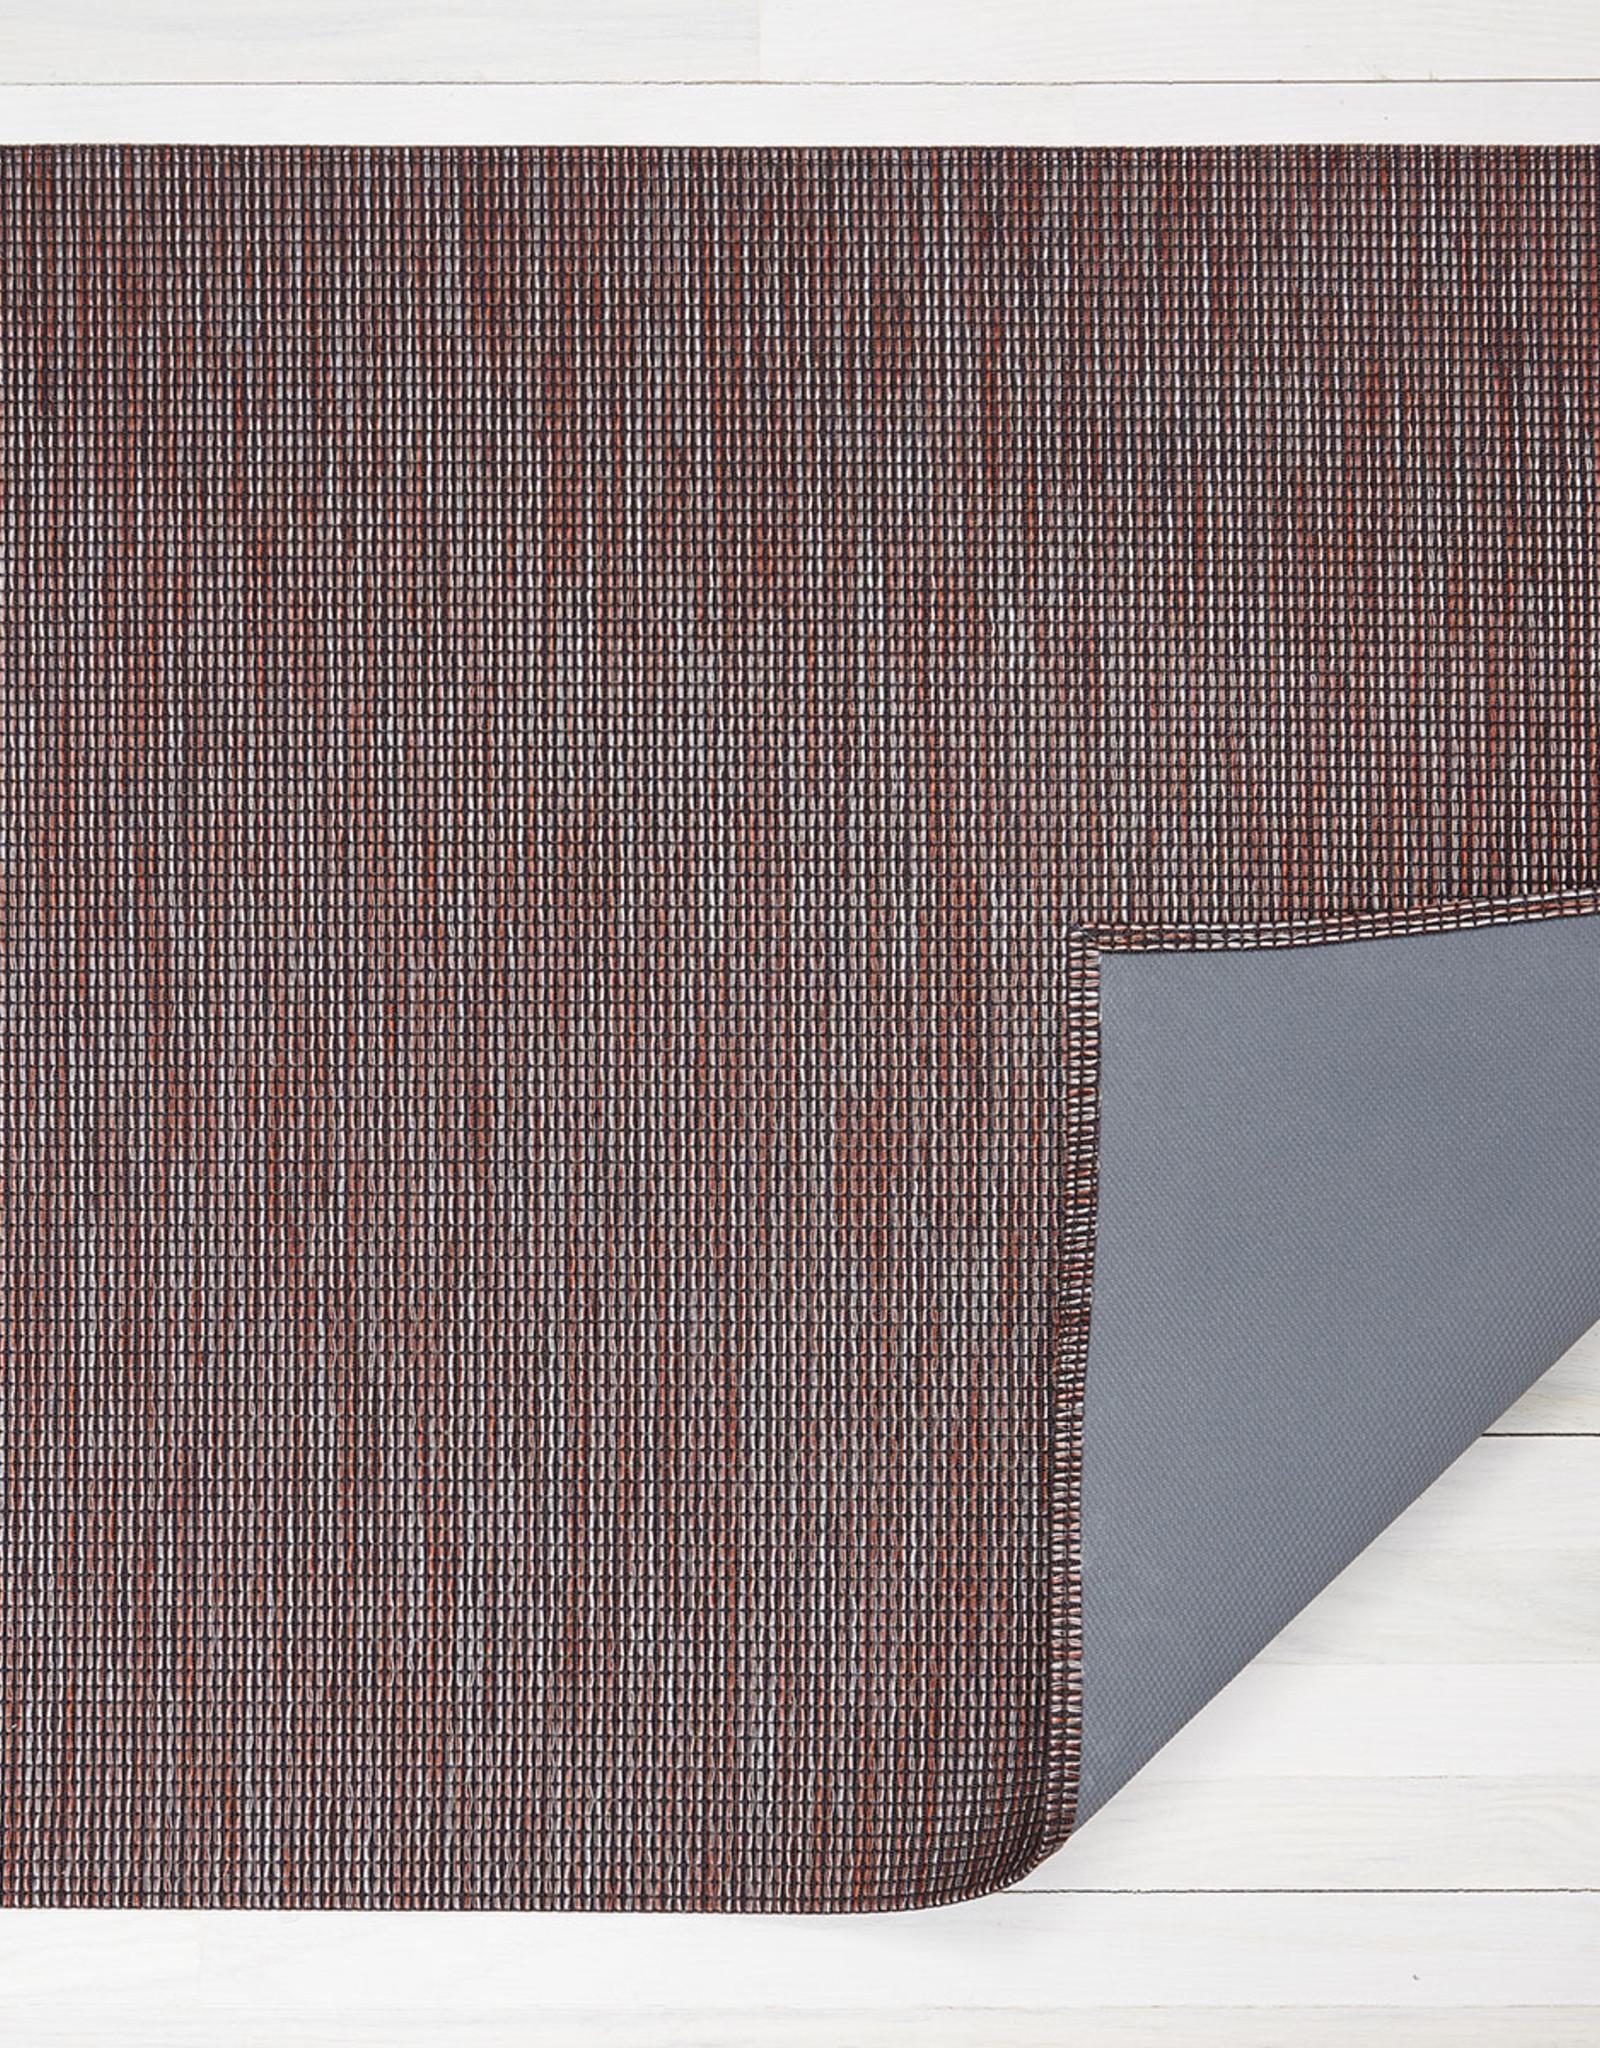 Chilewich Wabi Sabi Floormat 26X72, SIENNA